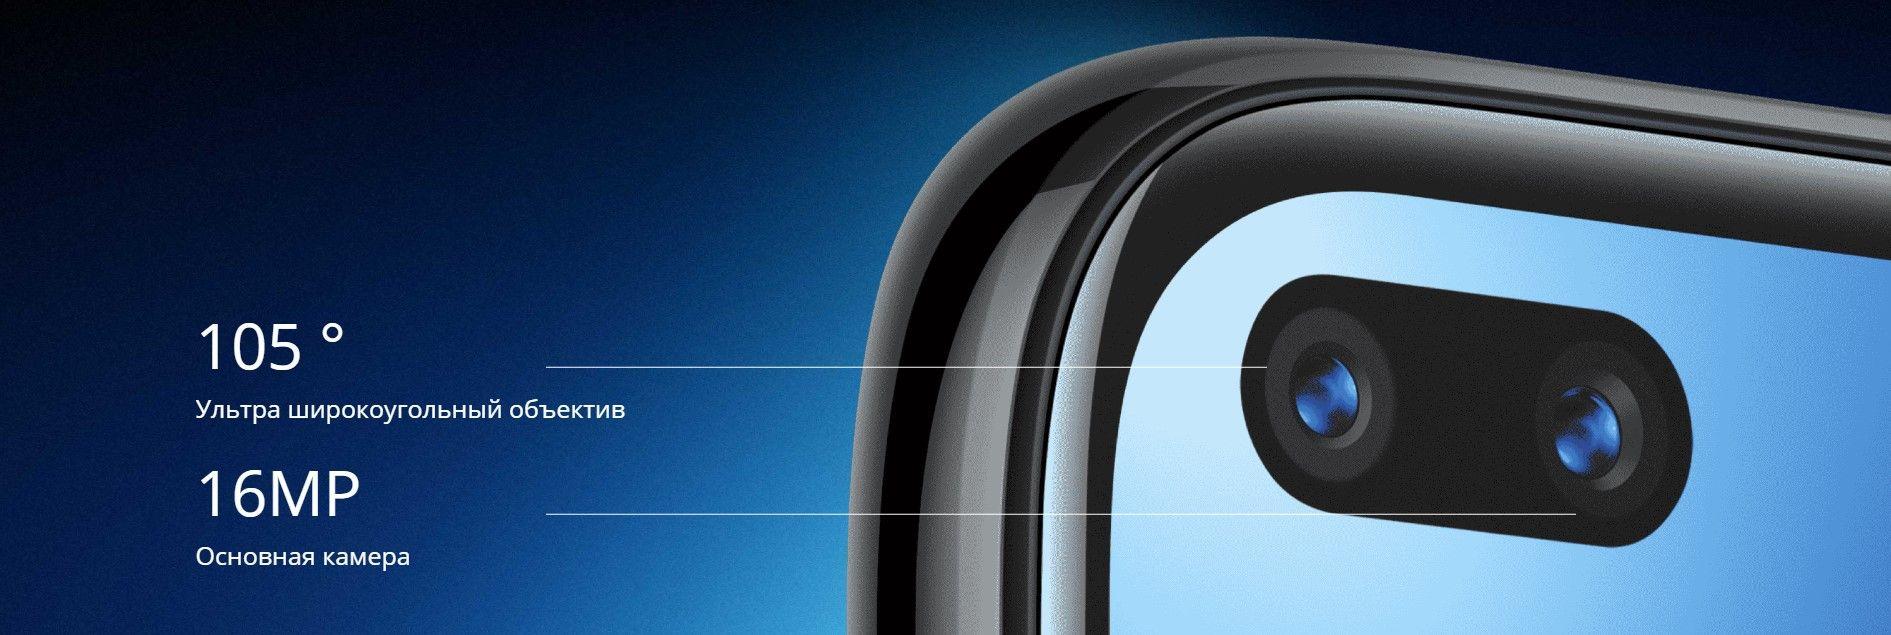 Realme 6 Pro фронтальная камера